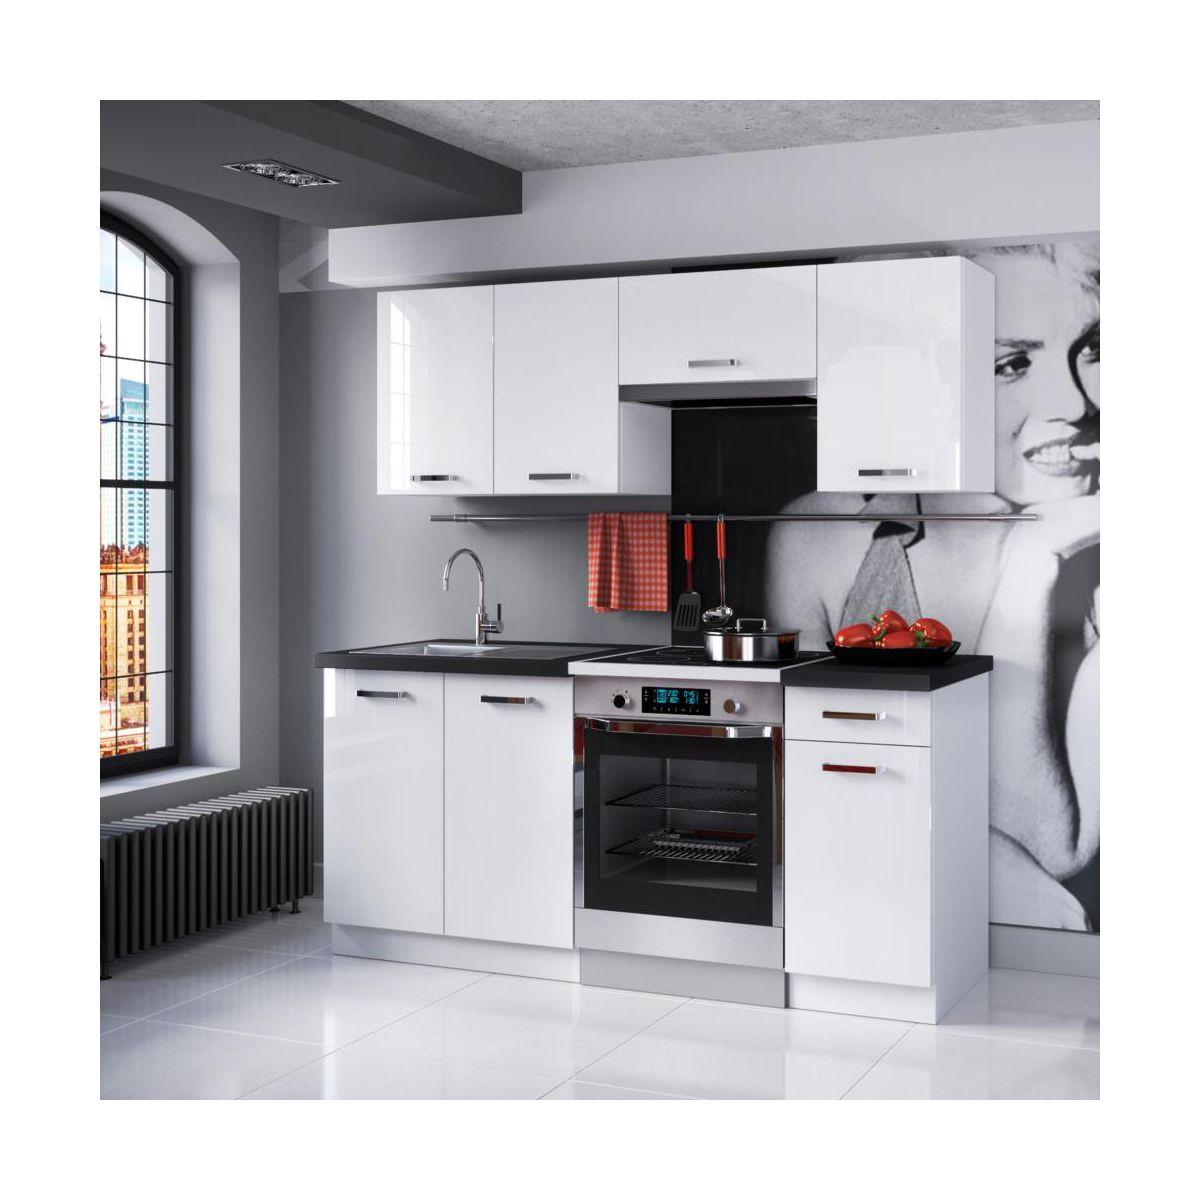 Zestaw mebli kuchennych TERNI 2 PROMO CLASSEN